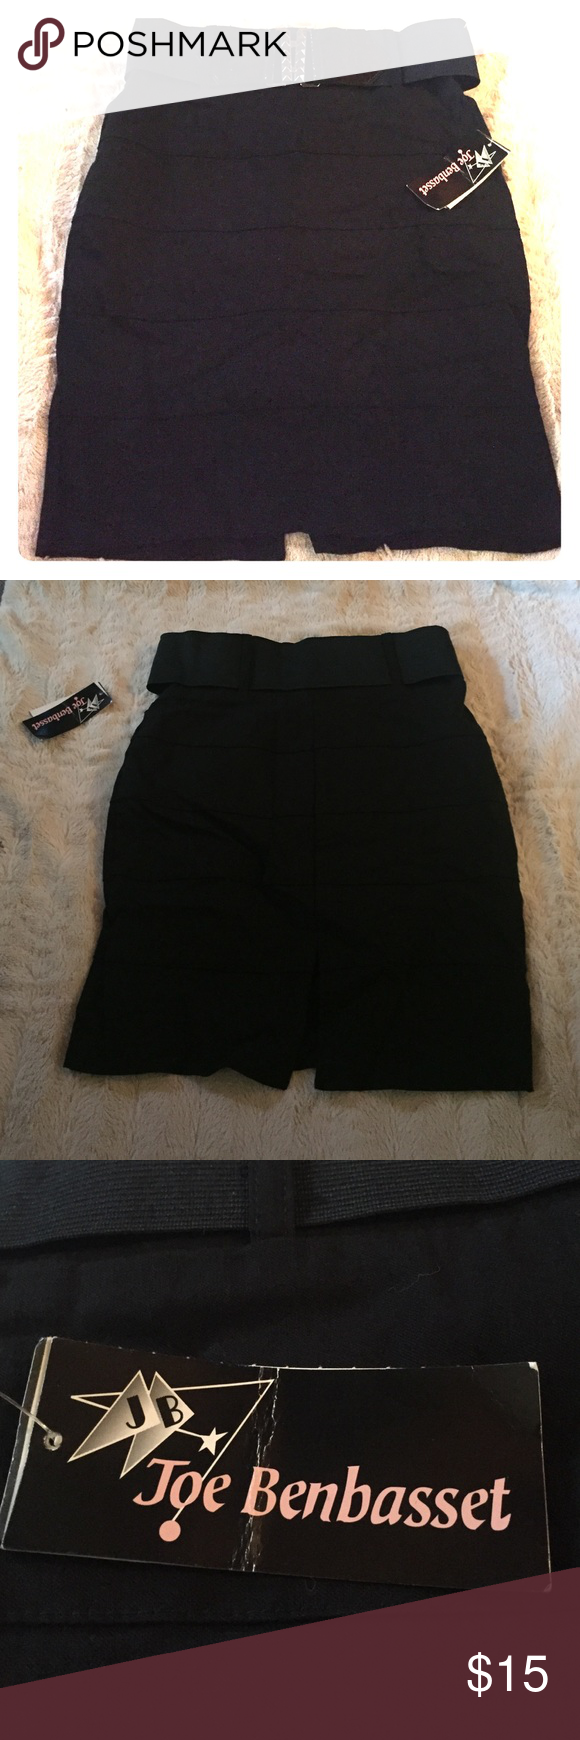 Black Pencil Skirt NWT. Black skirt, Detachable belt. Joe Benbasset Dresses